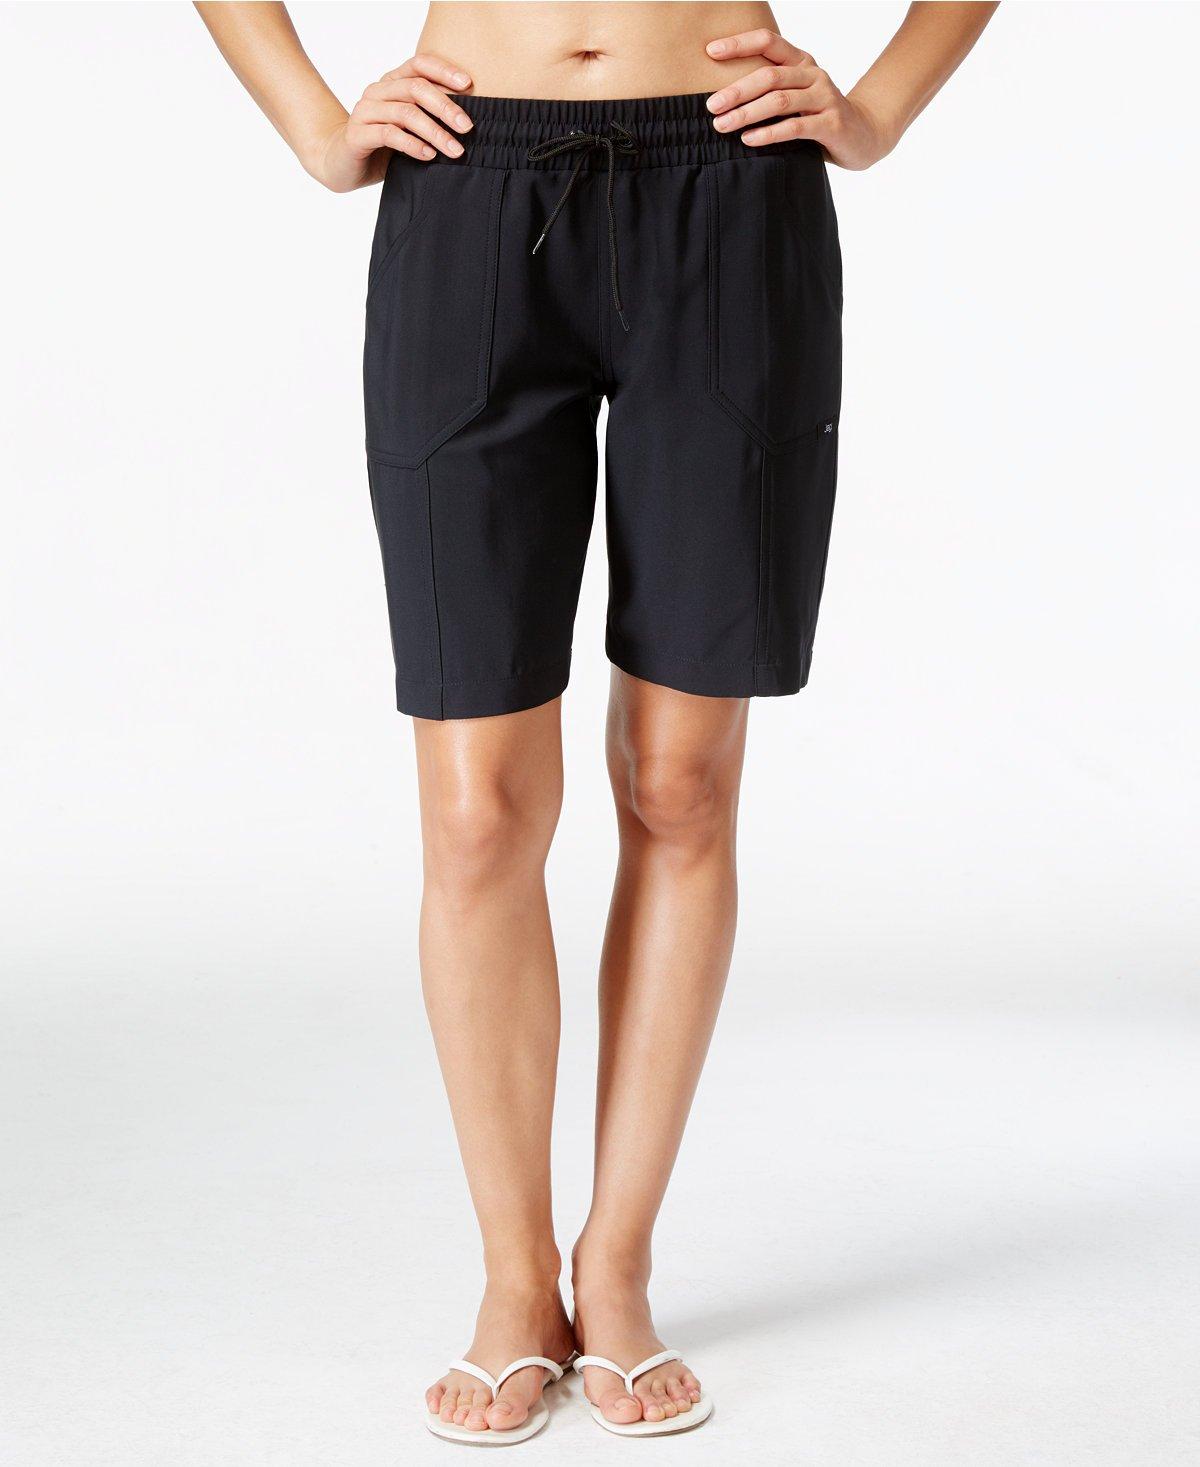 JAG Women's Drawstring Long Length Board Shorts (Small, Black)